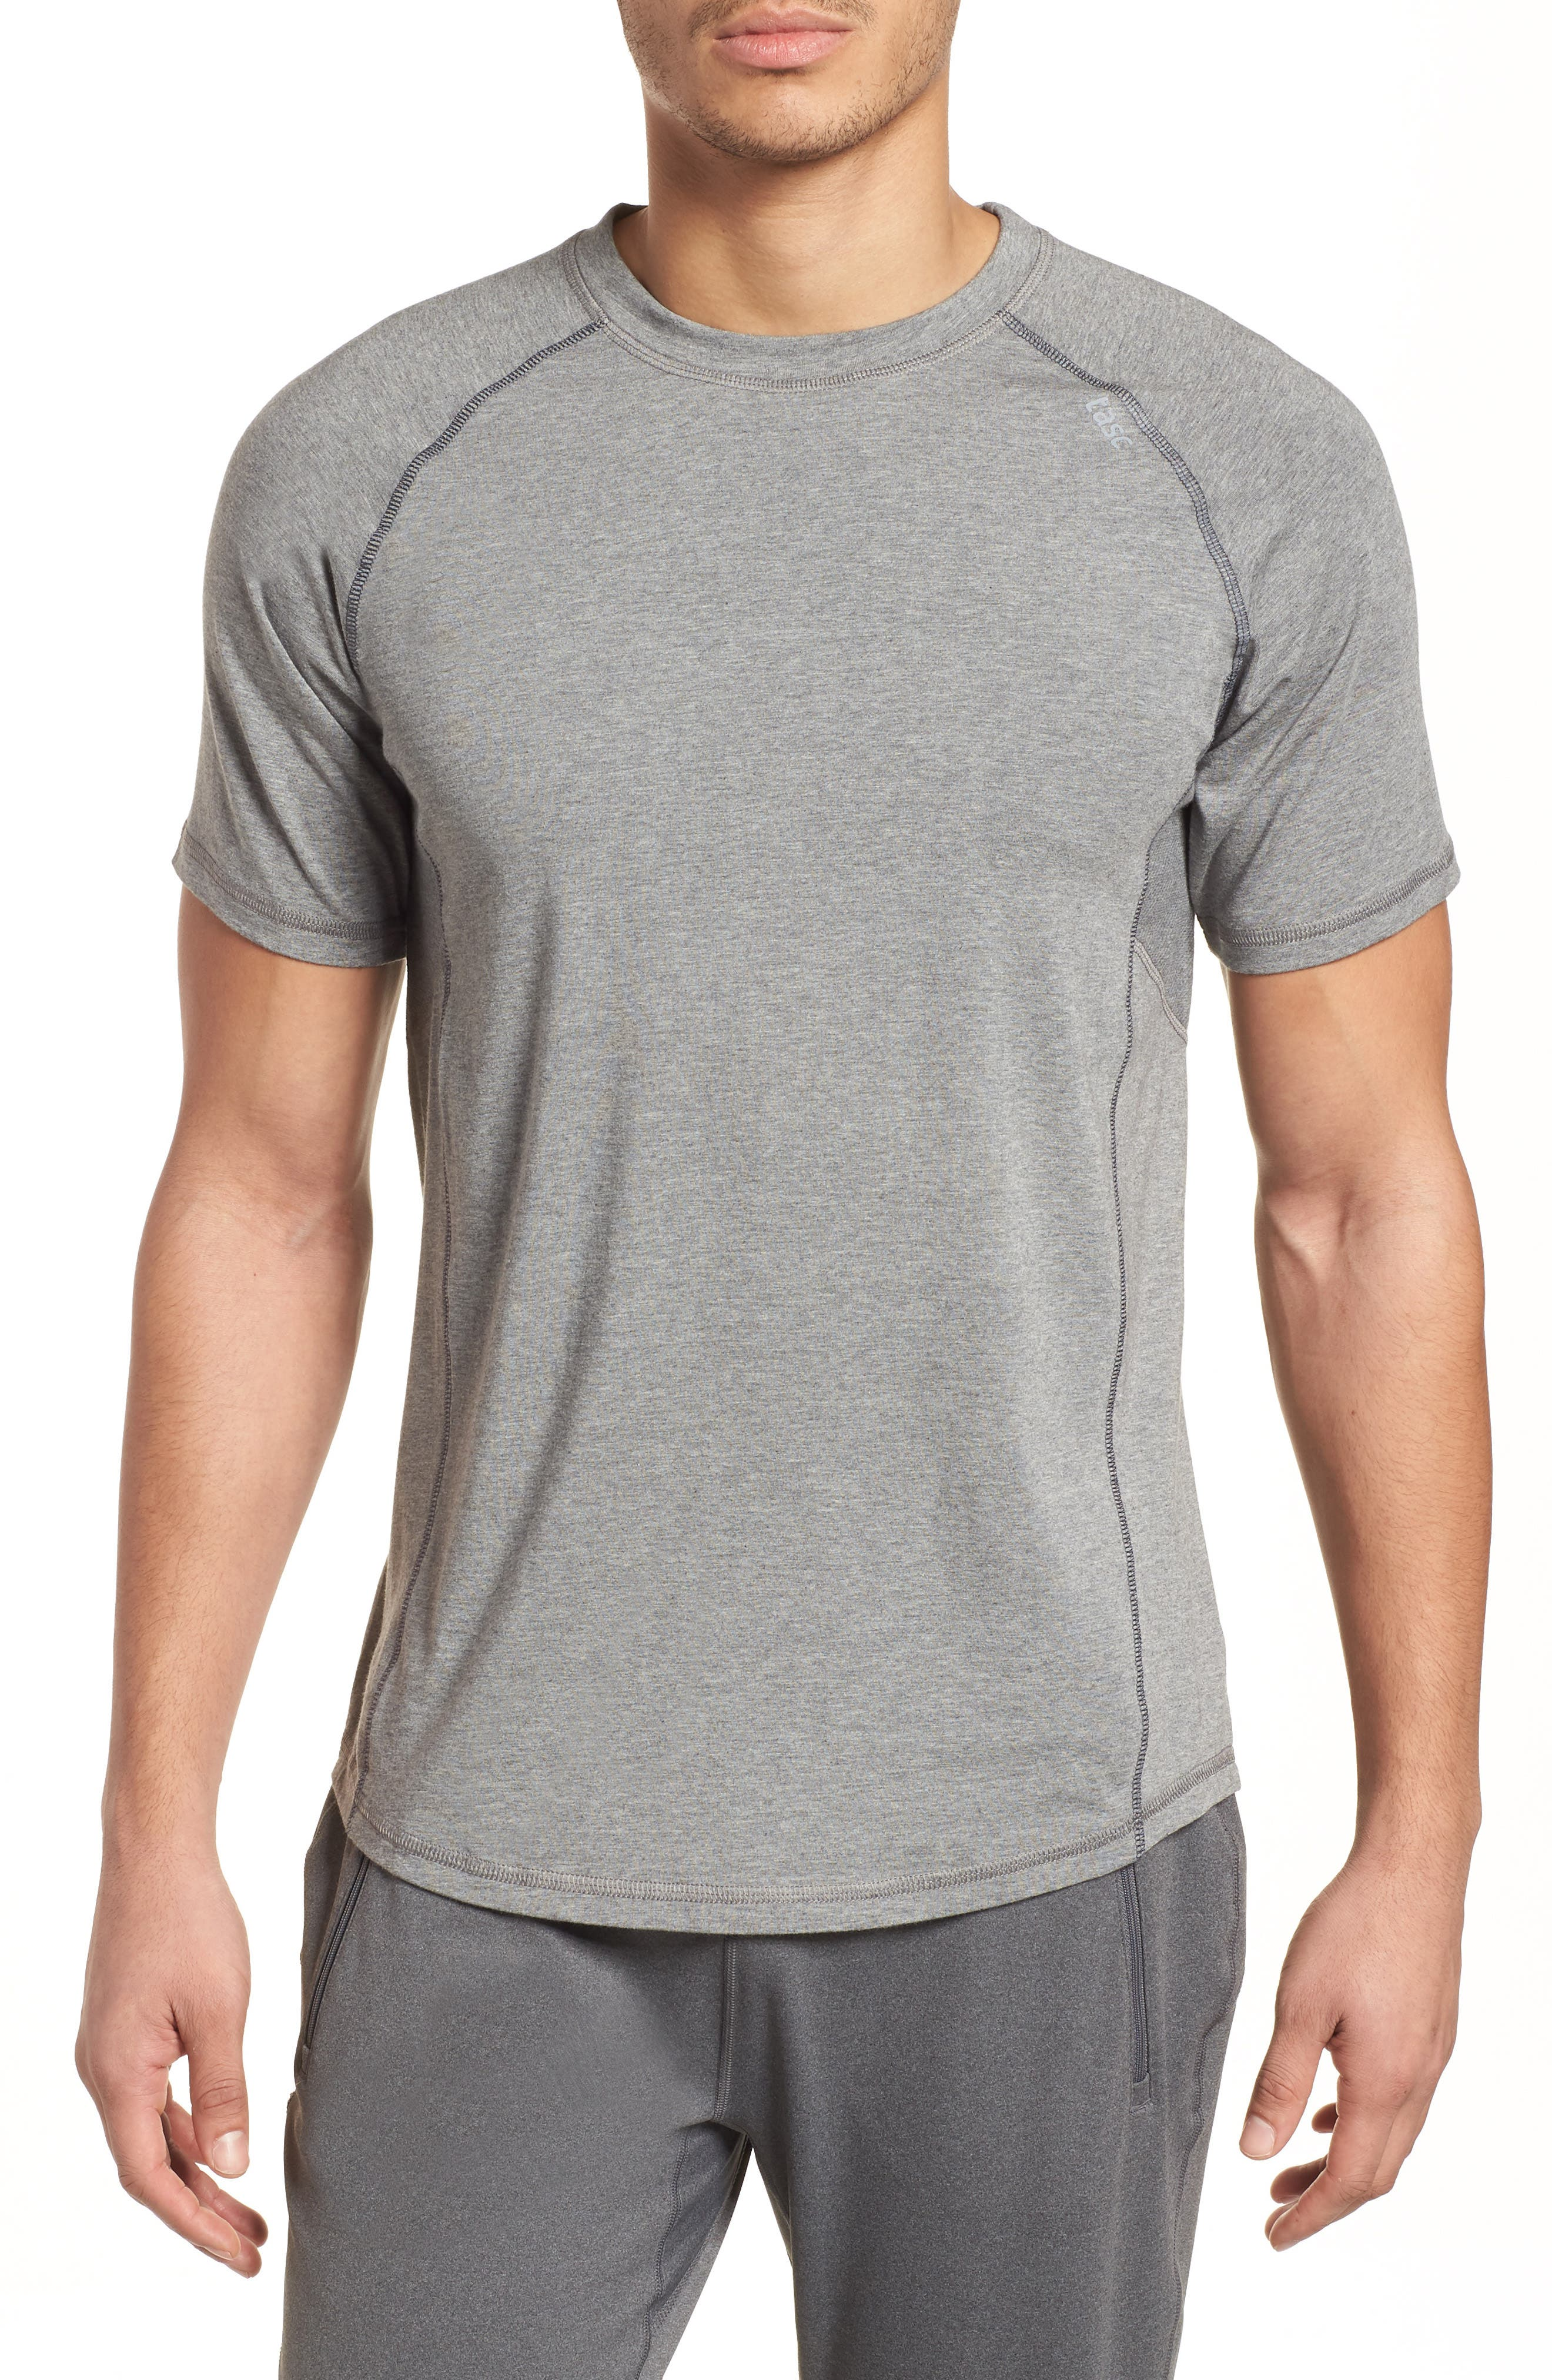 TASC PERFORMANCE, Charge II T-Shirt, Main thumbnail 1, color, HEATHER GREY